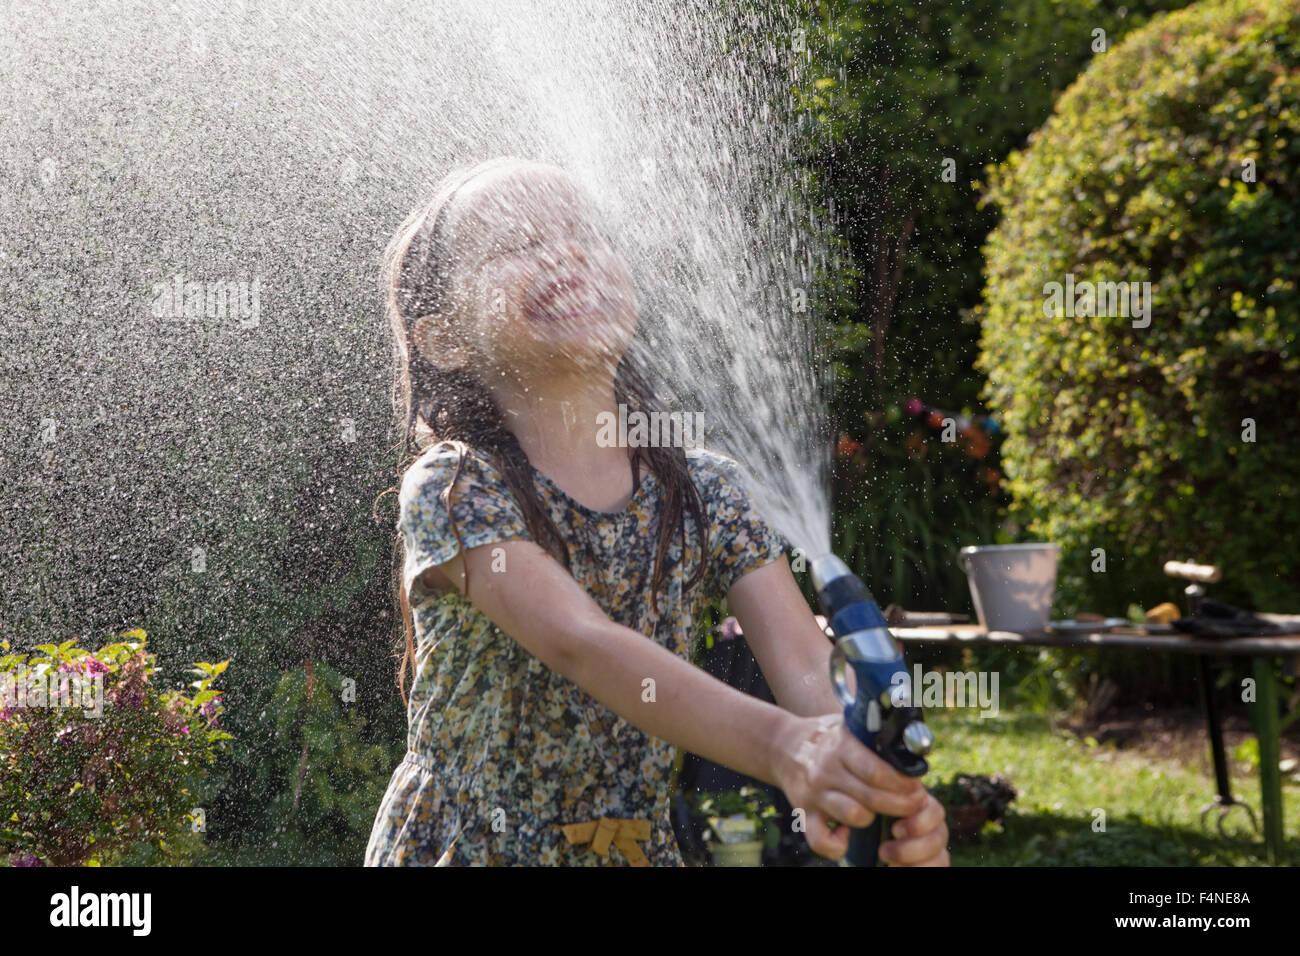 Girl splashing with water in garden - Stock Image